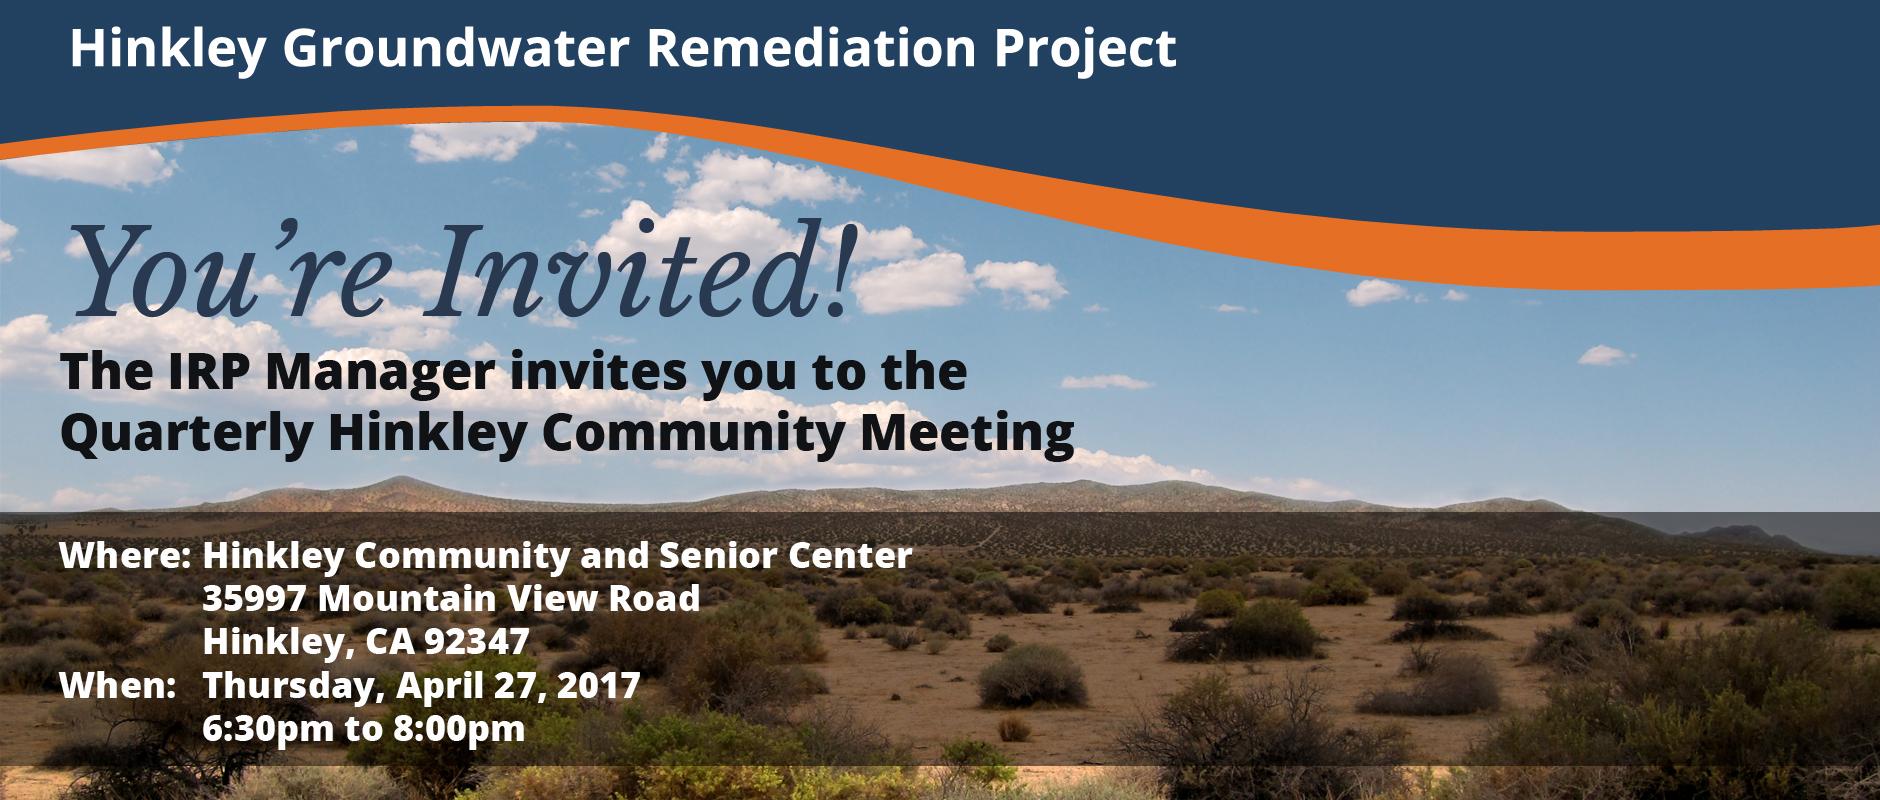 Hinkley Community Meeting, April 27, 2017